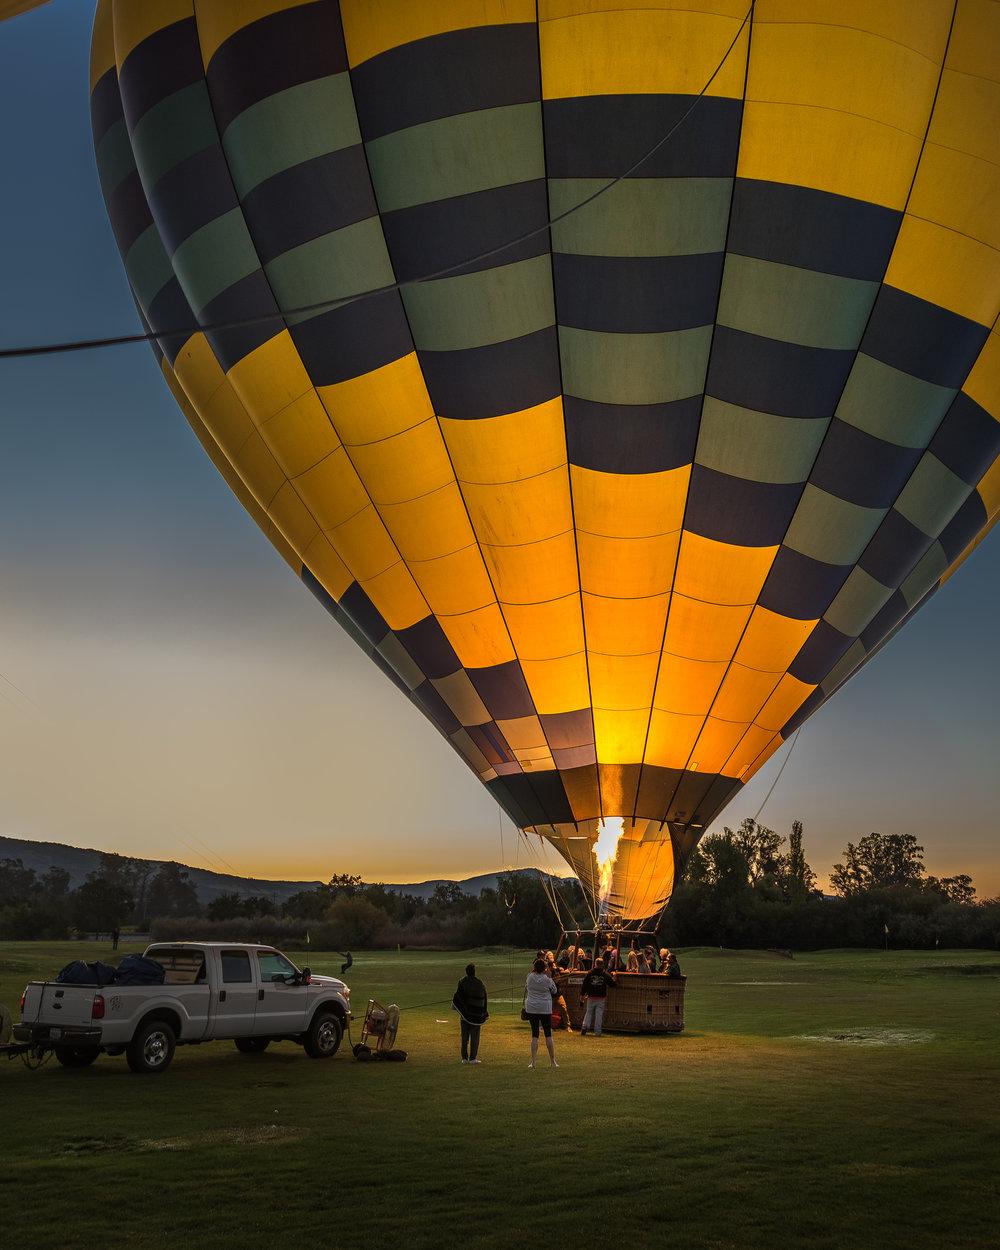 NAPA-Baloon-14.jpg